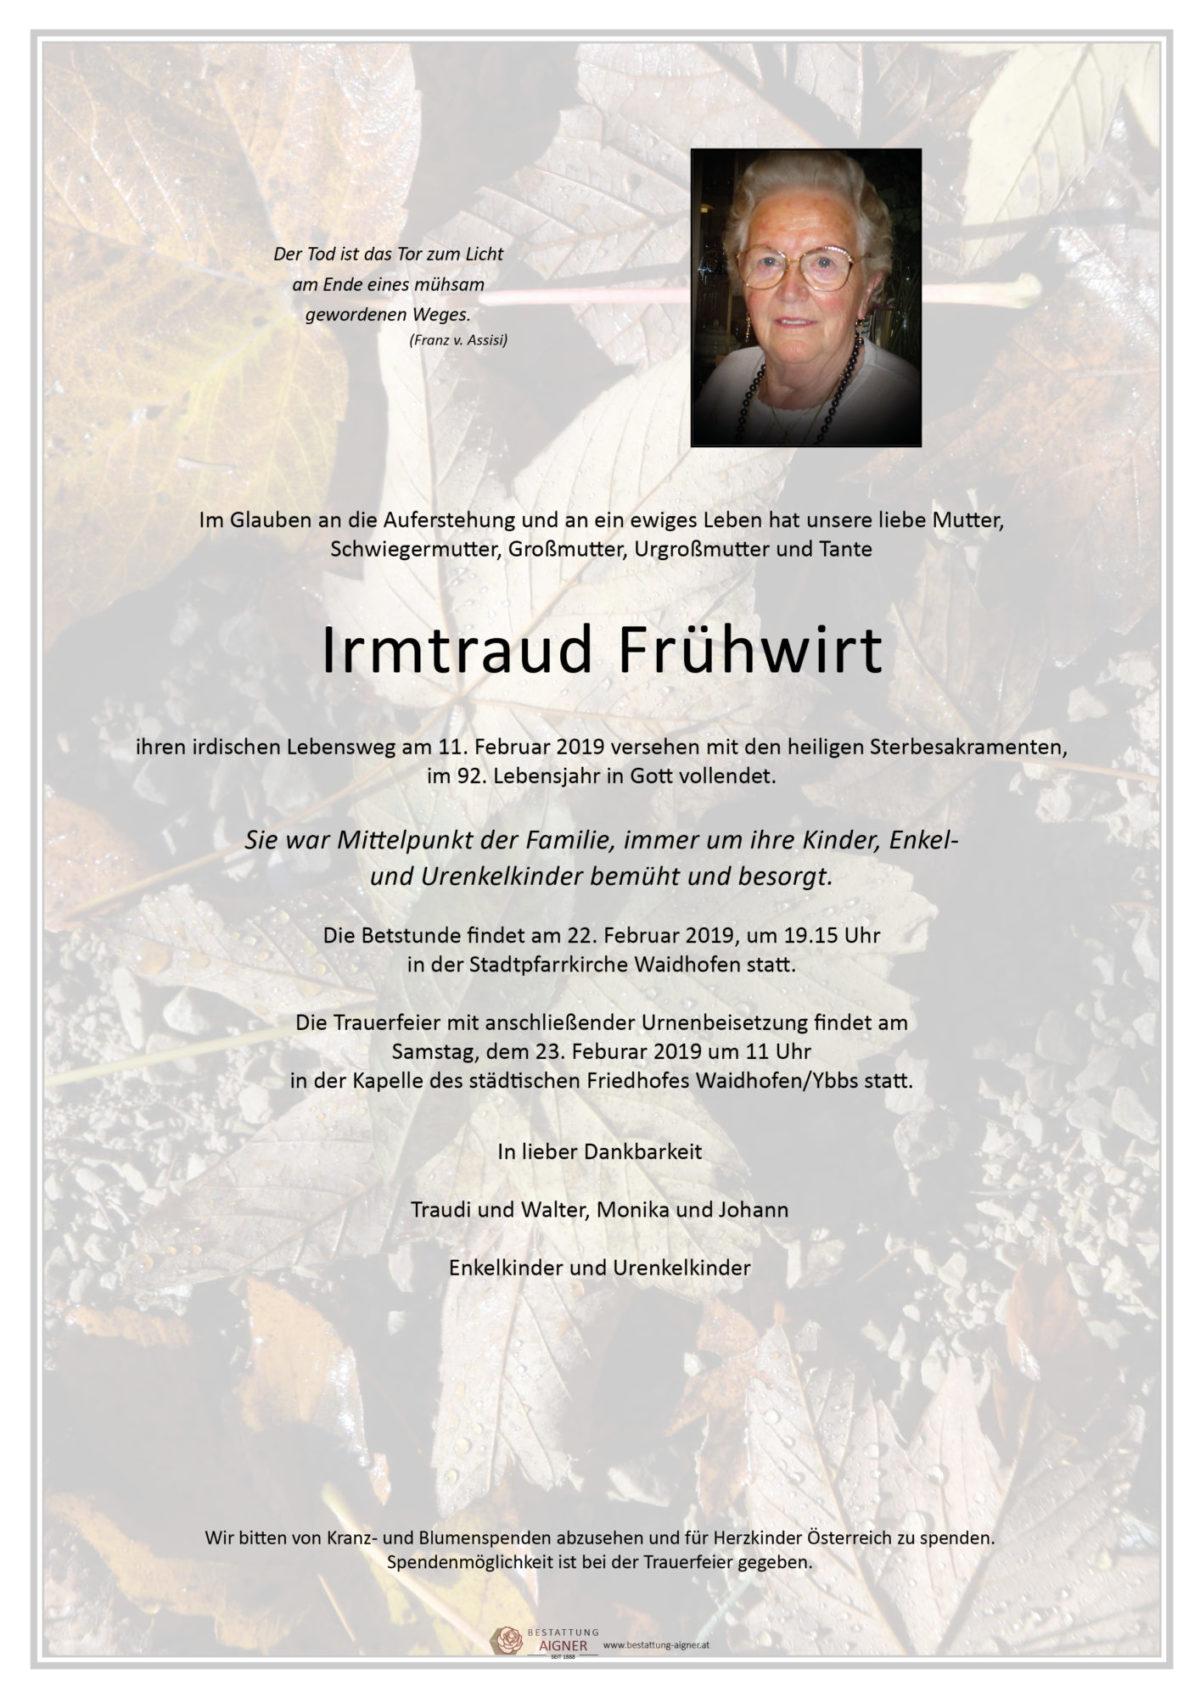 Irmtraud Frühwirth